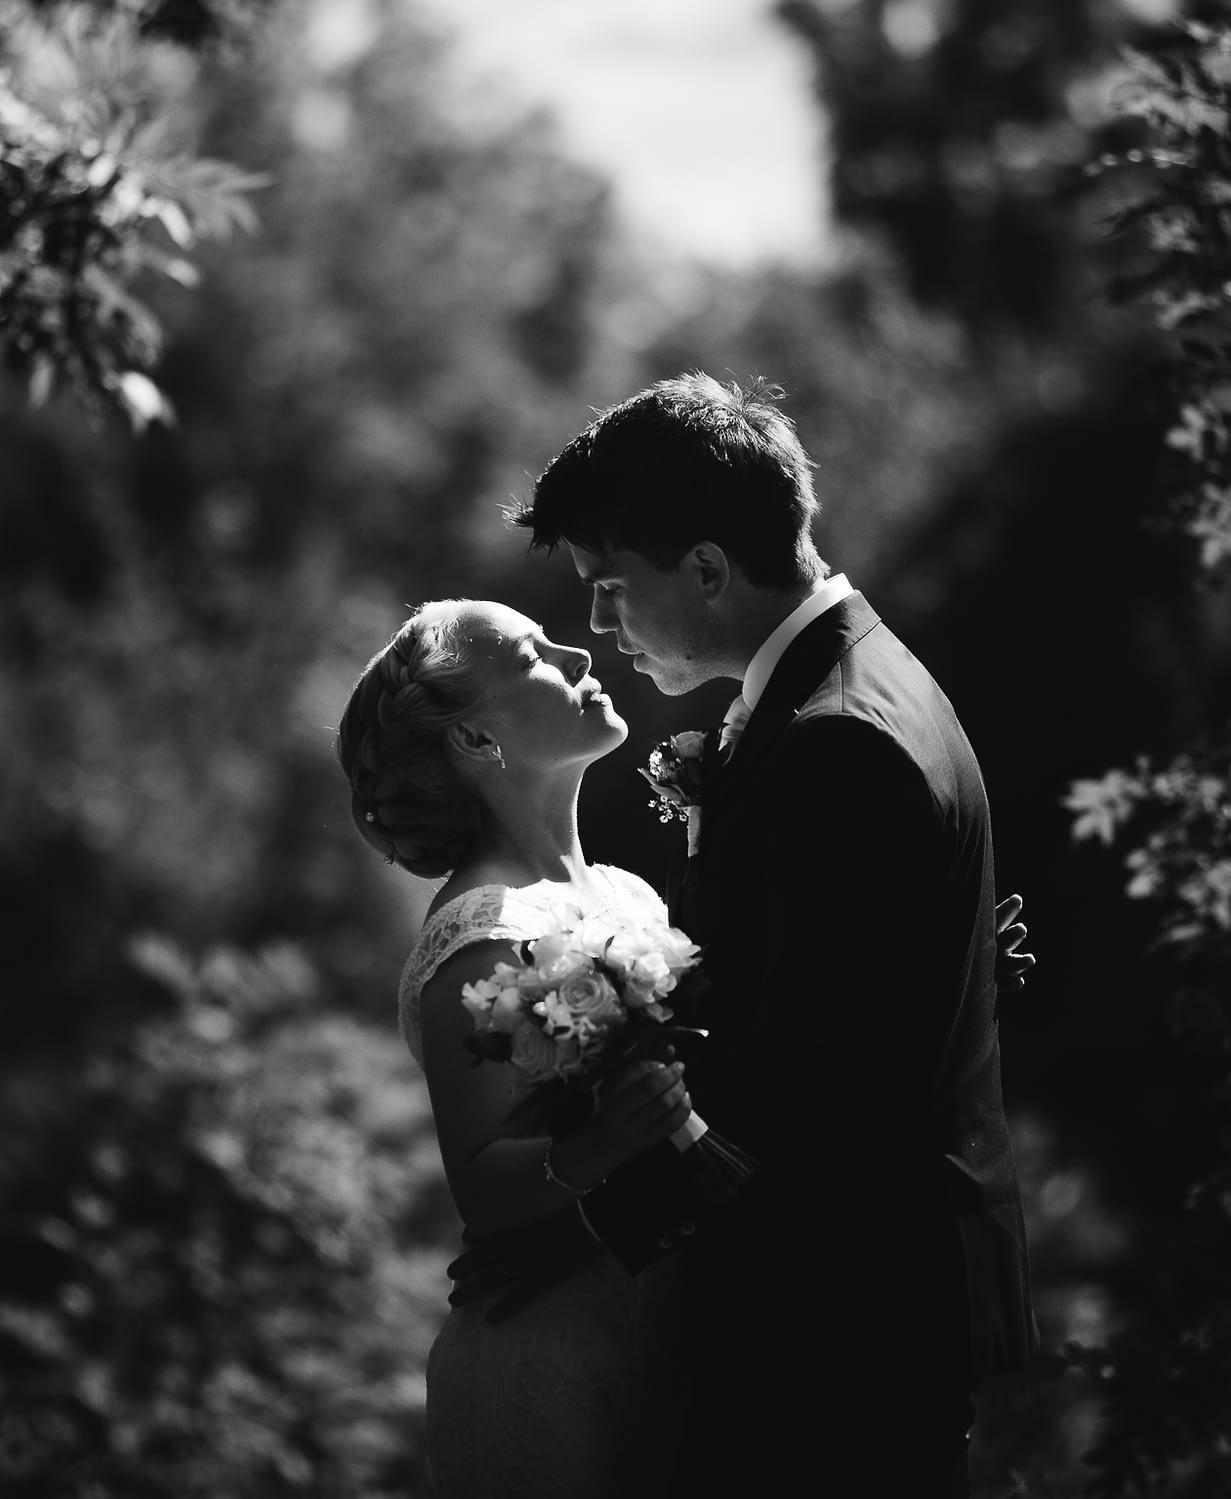 photographe artistique de mariage